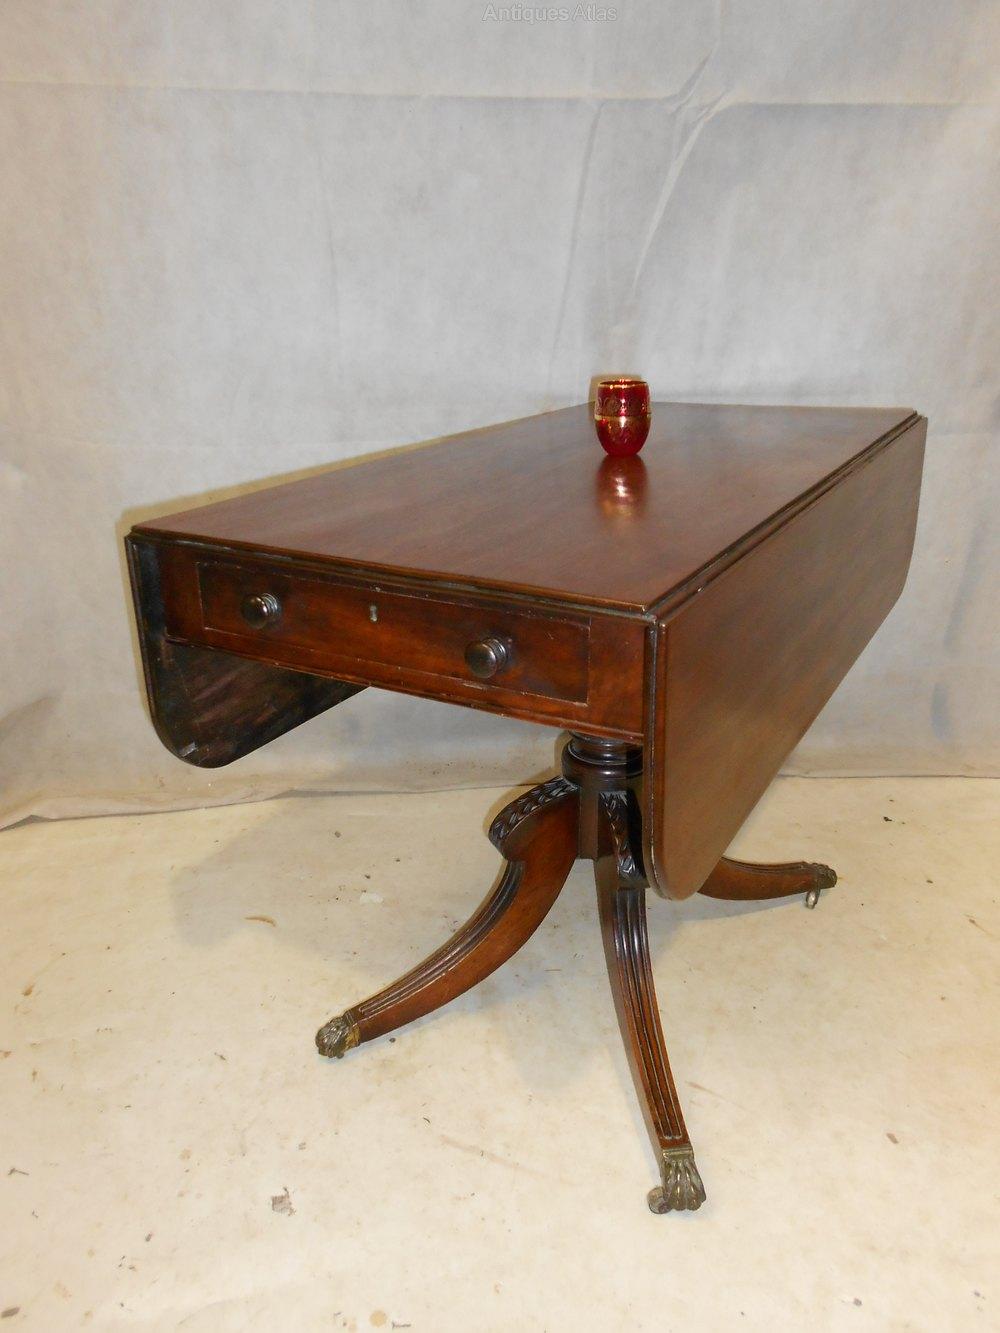 Antique regency sofa table c1811 20 antiques atlas antique regency sofa table c1811 20 geotapseo Image collections